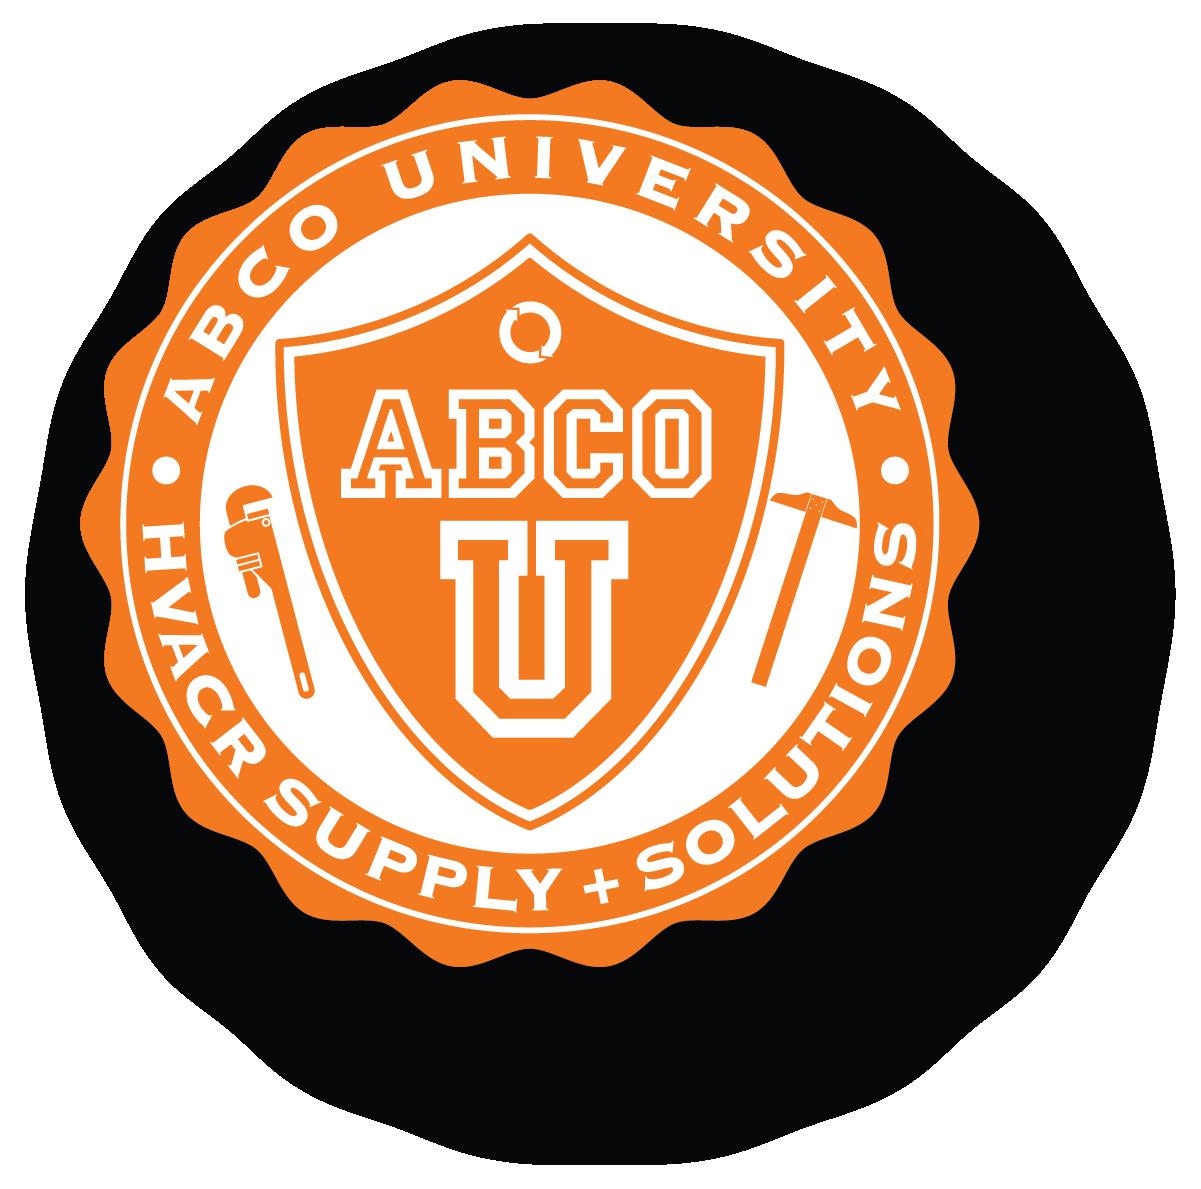 ABCO University.